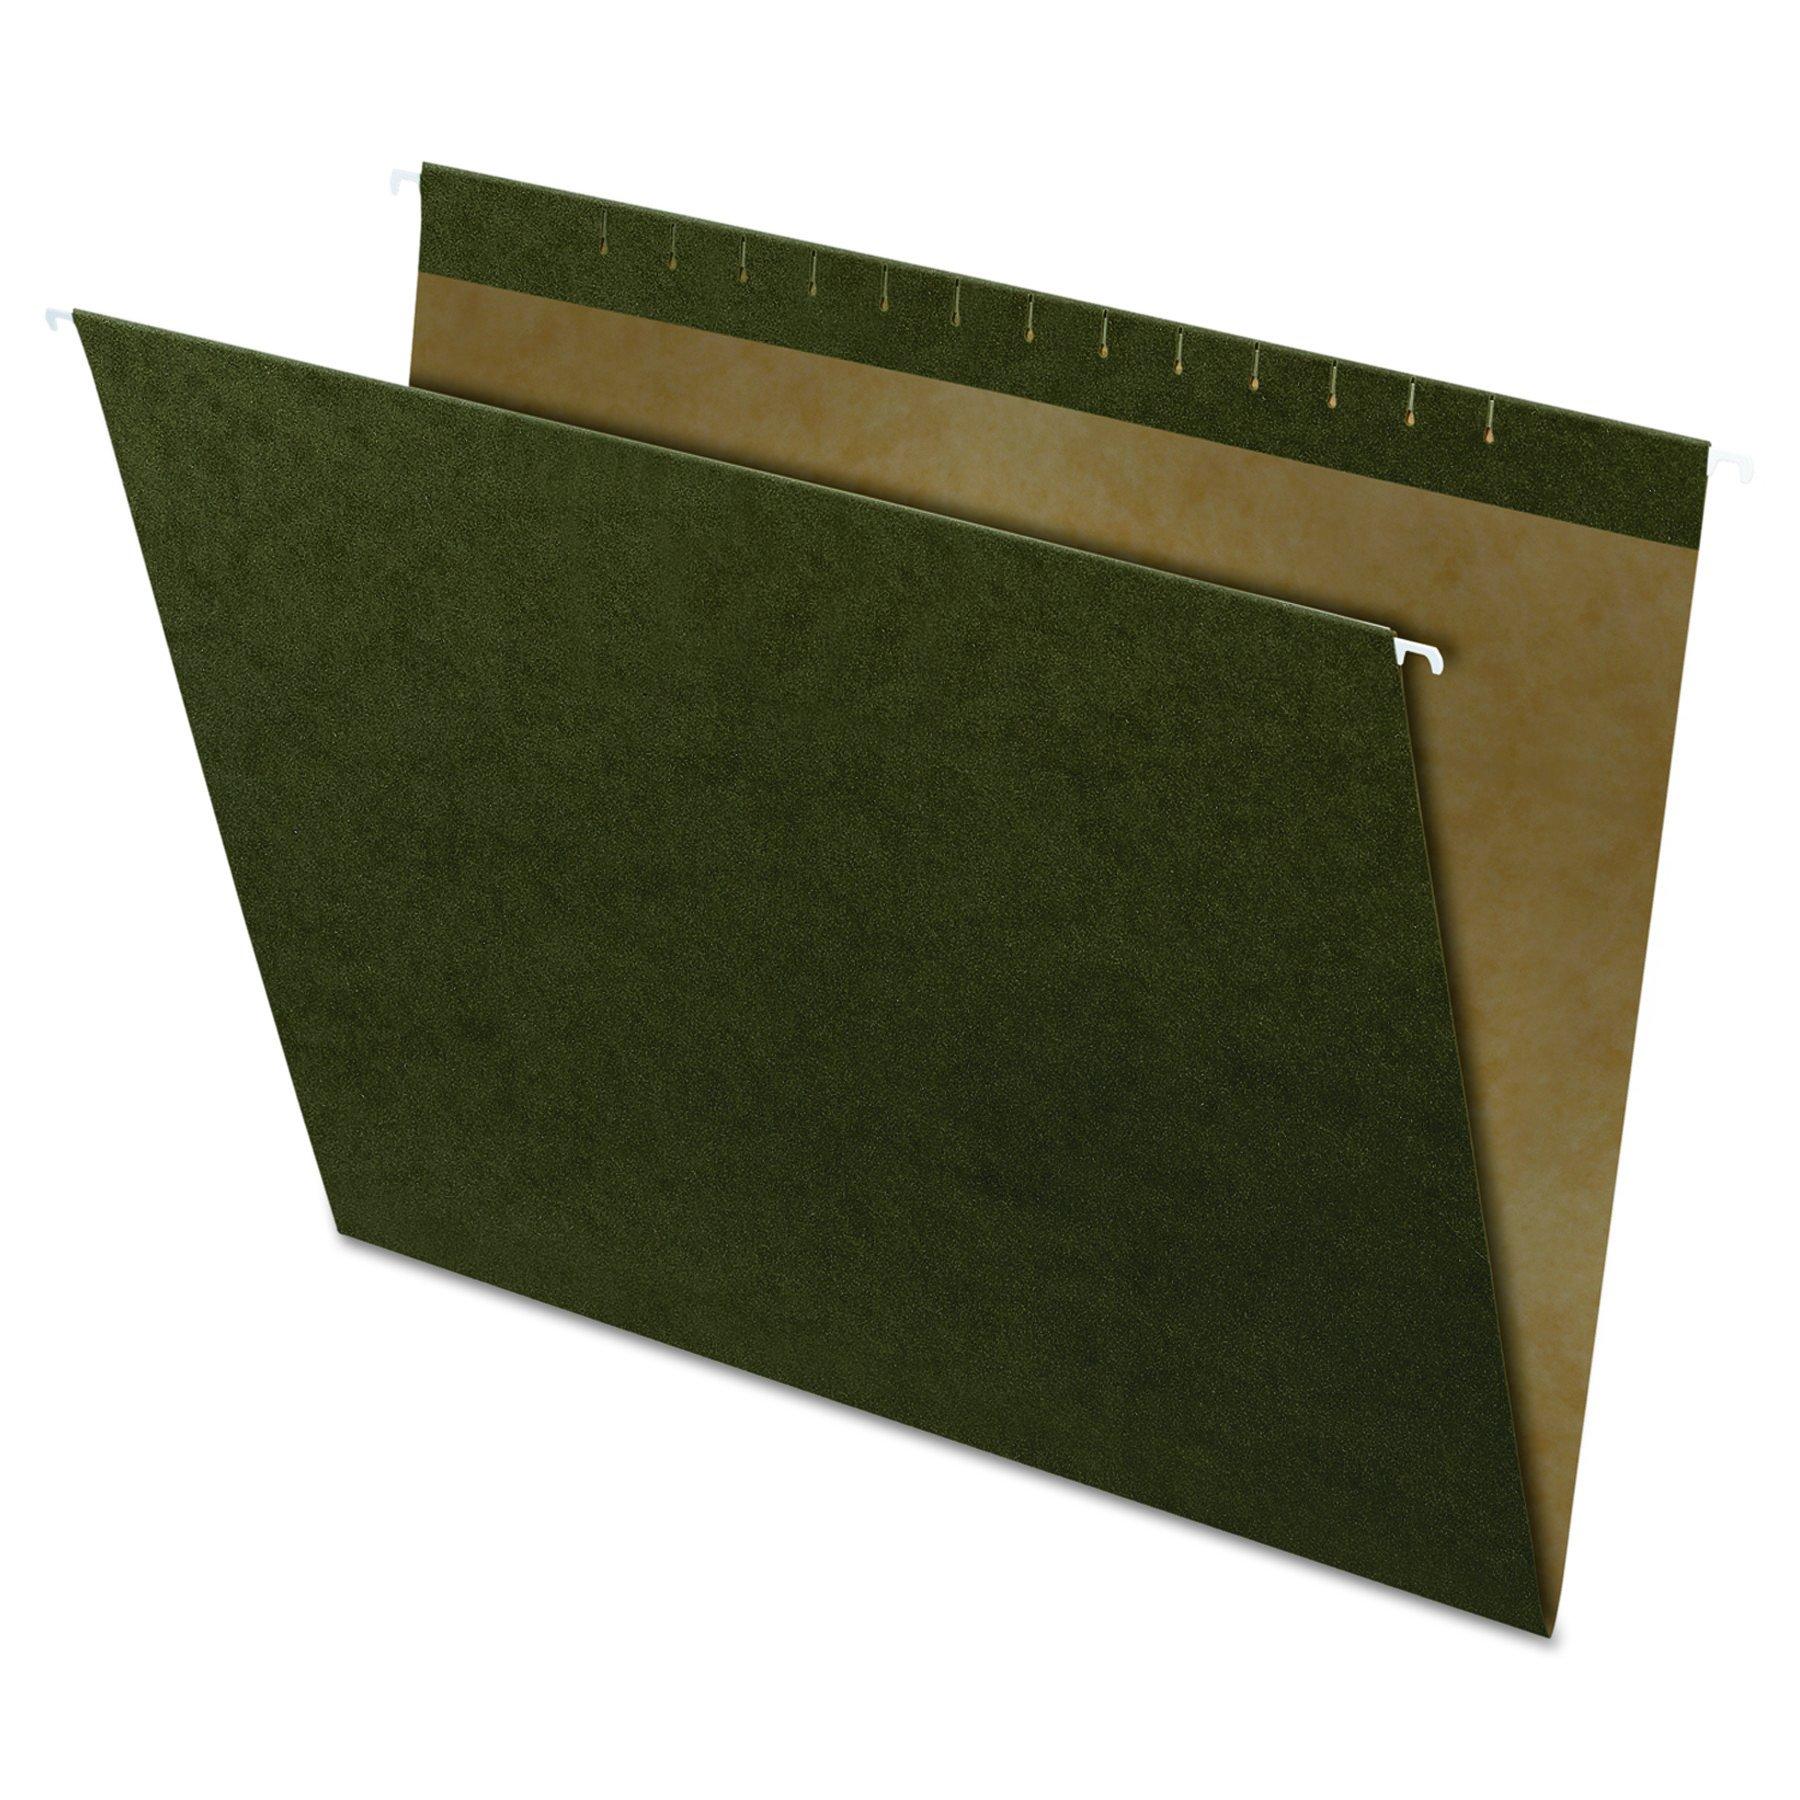 Pendaflex 4158 X-Ray Hanging File Folders, Standard Green (Box of 25)